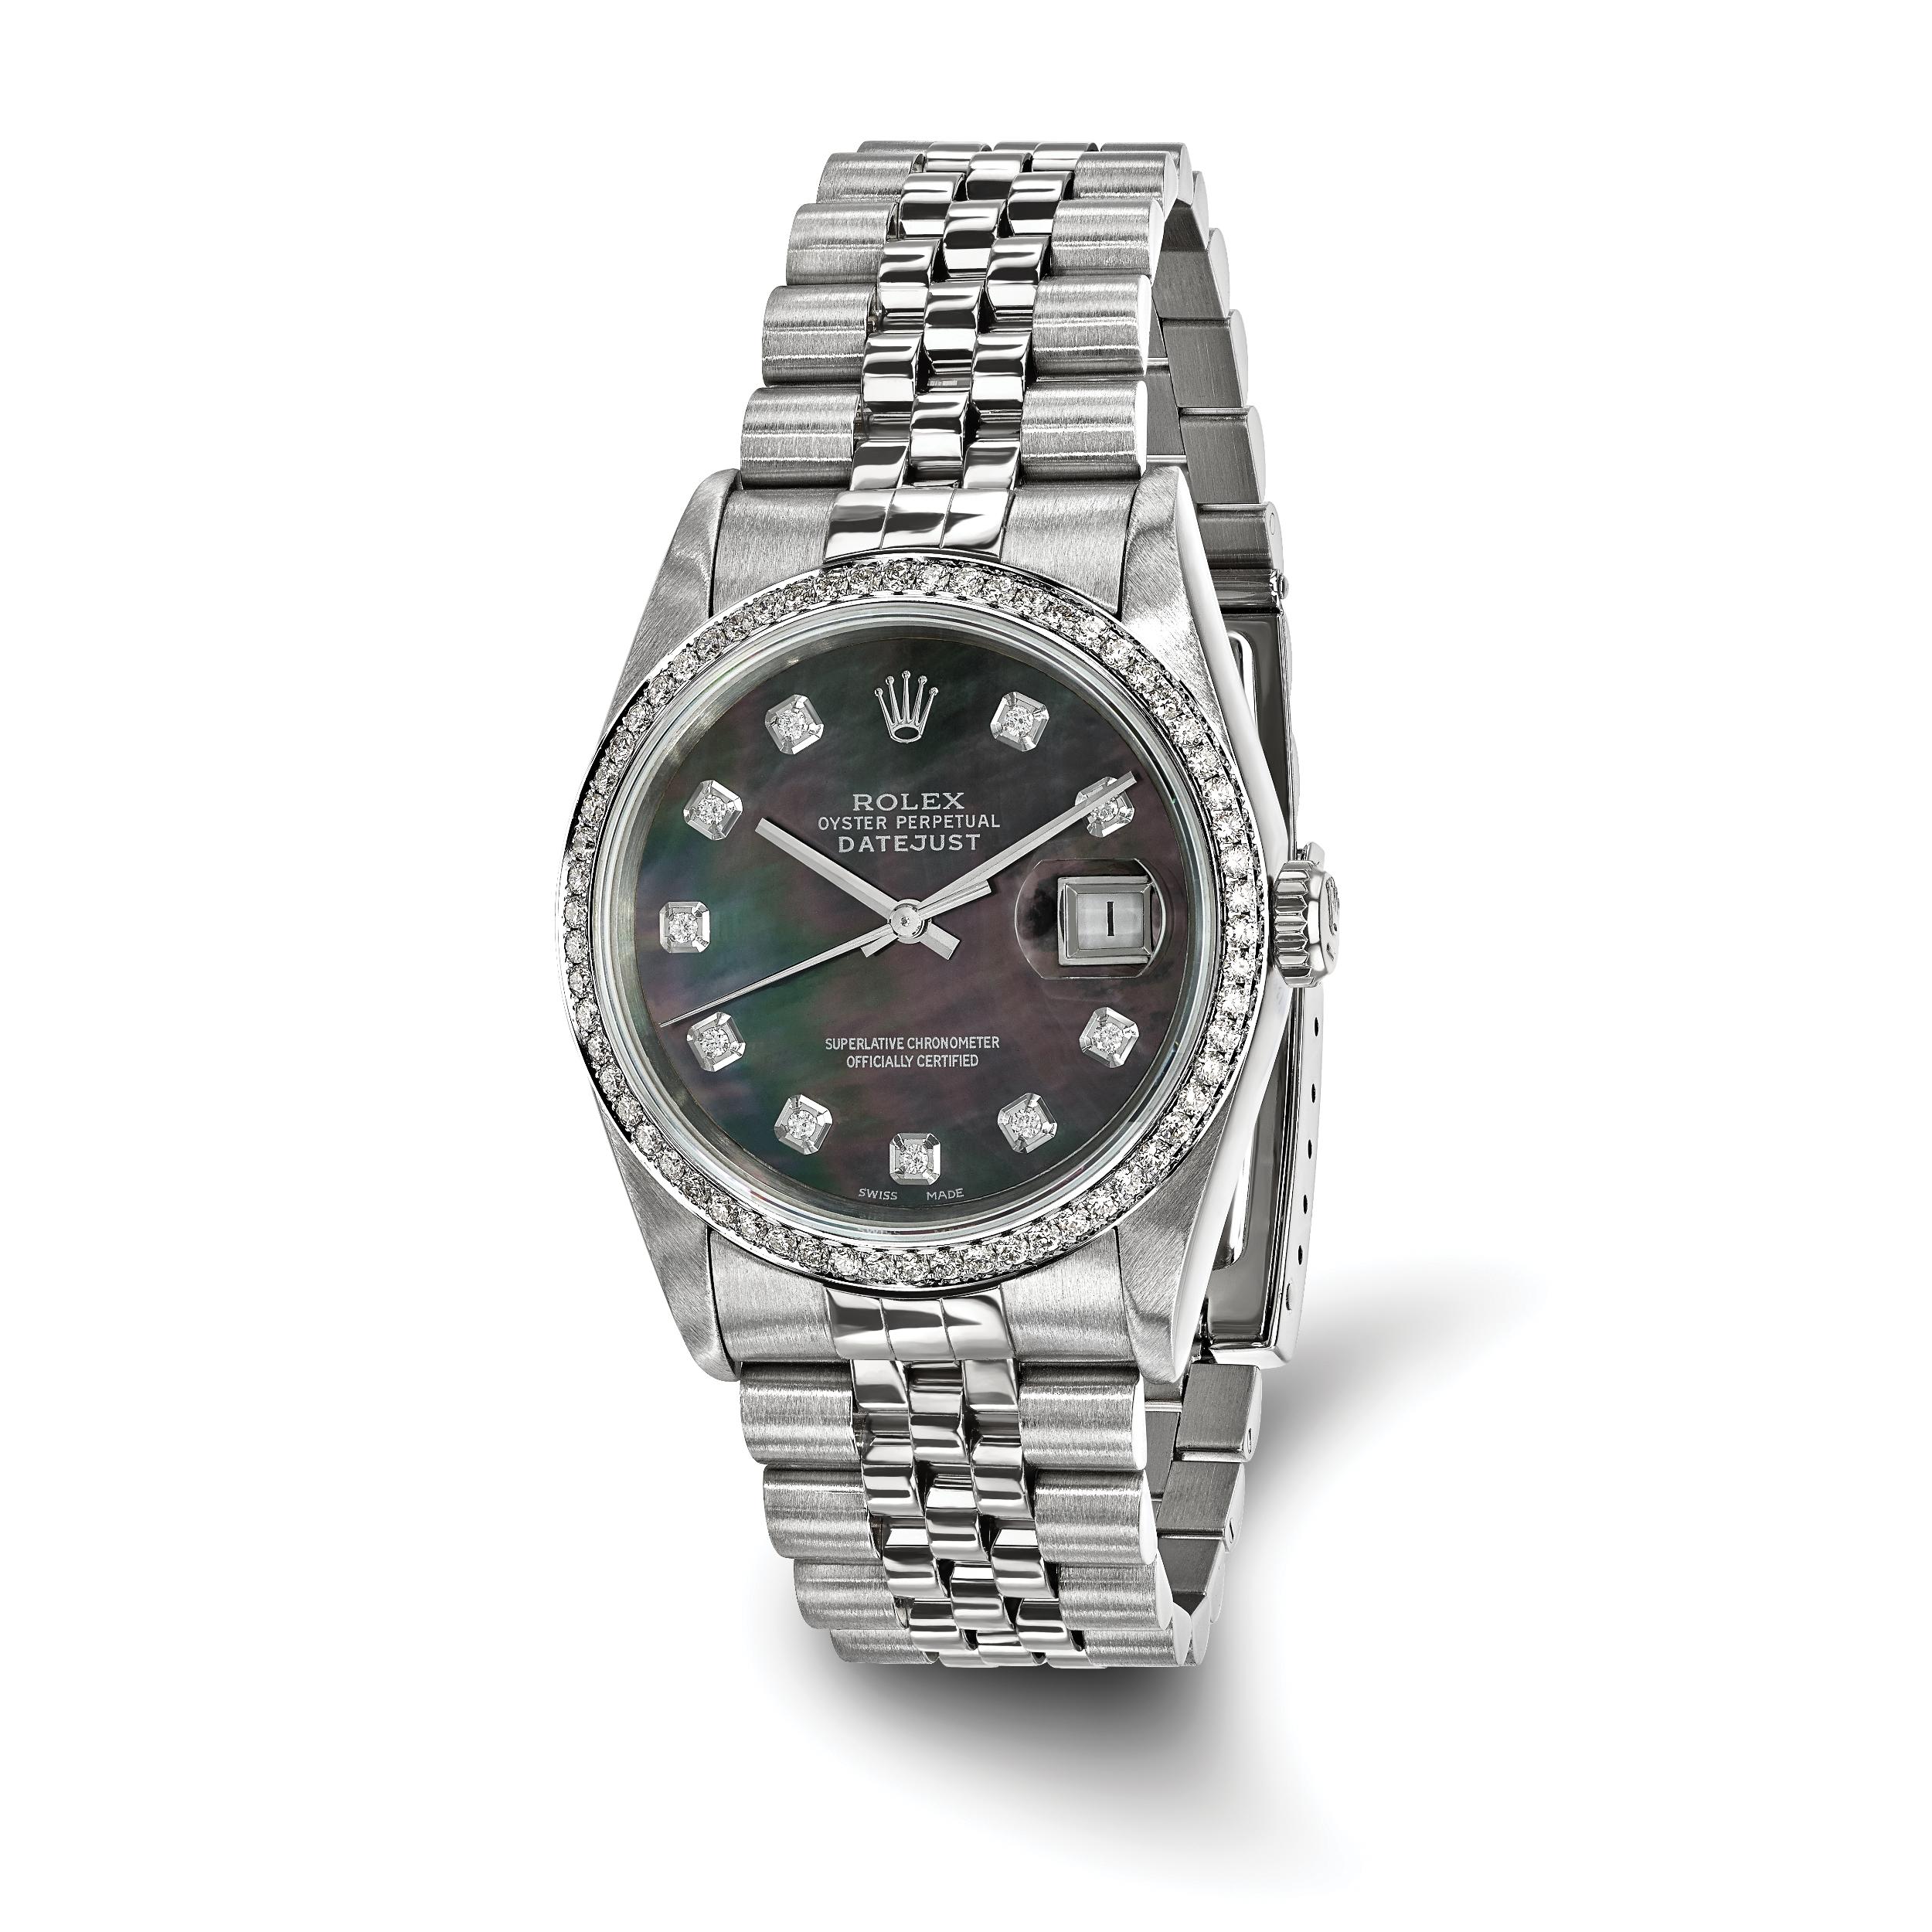 Pre-owned Rolex Steel/18kw Mens Diamond Datejust Watch